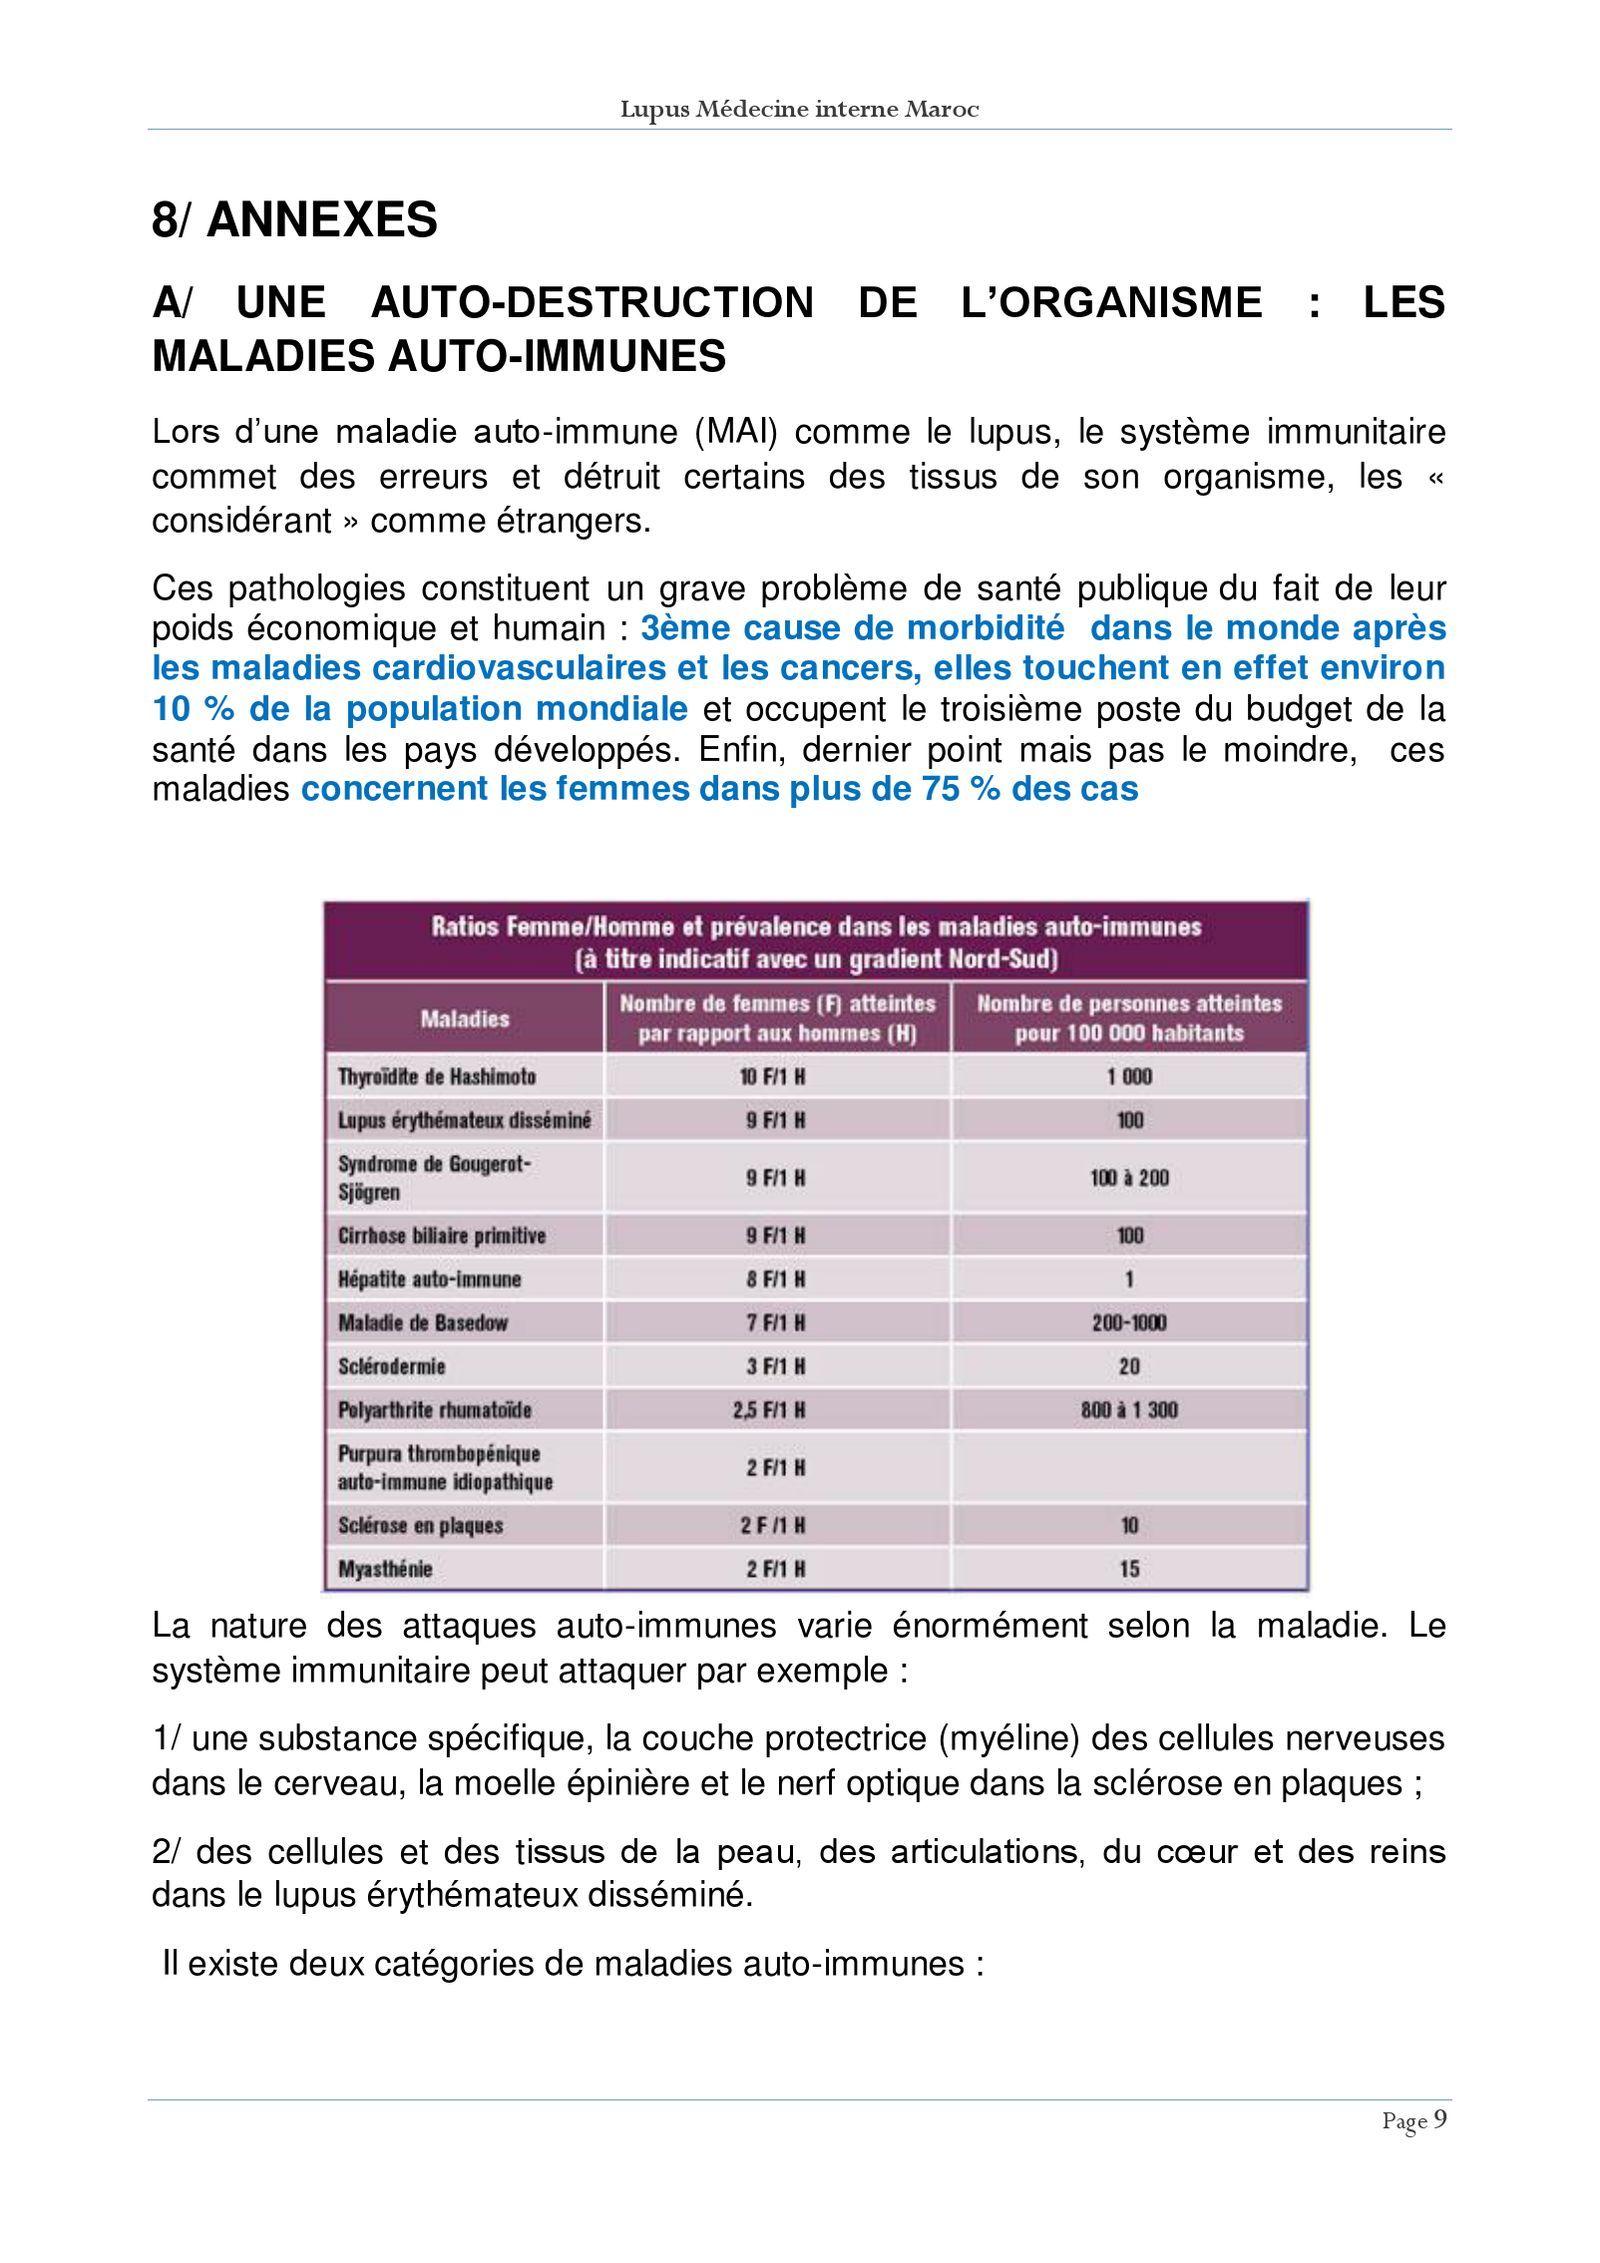 Le lupus en médecine interne au Maroc PDF to Flipbook